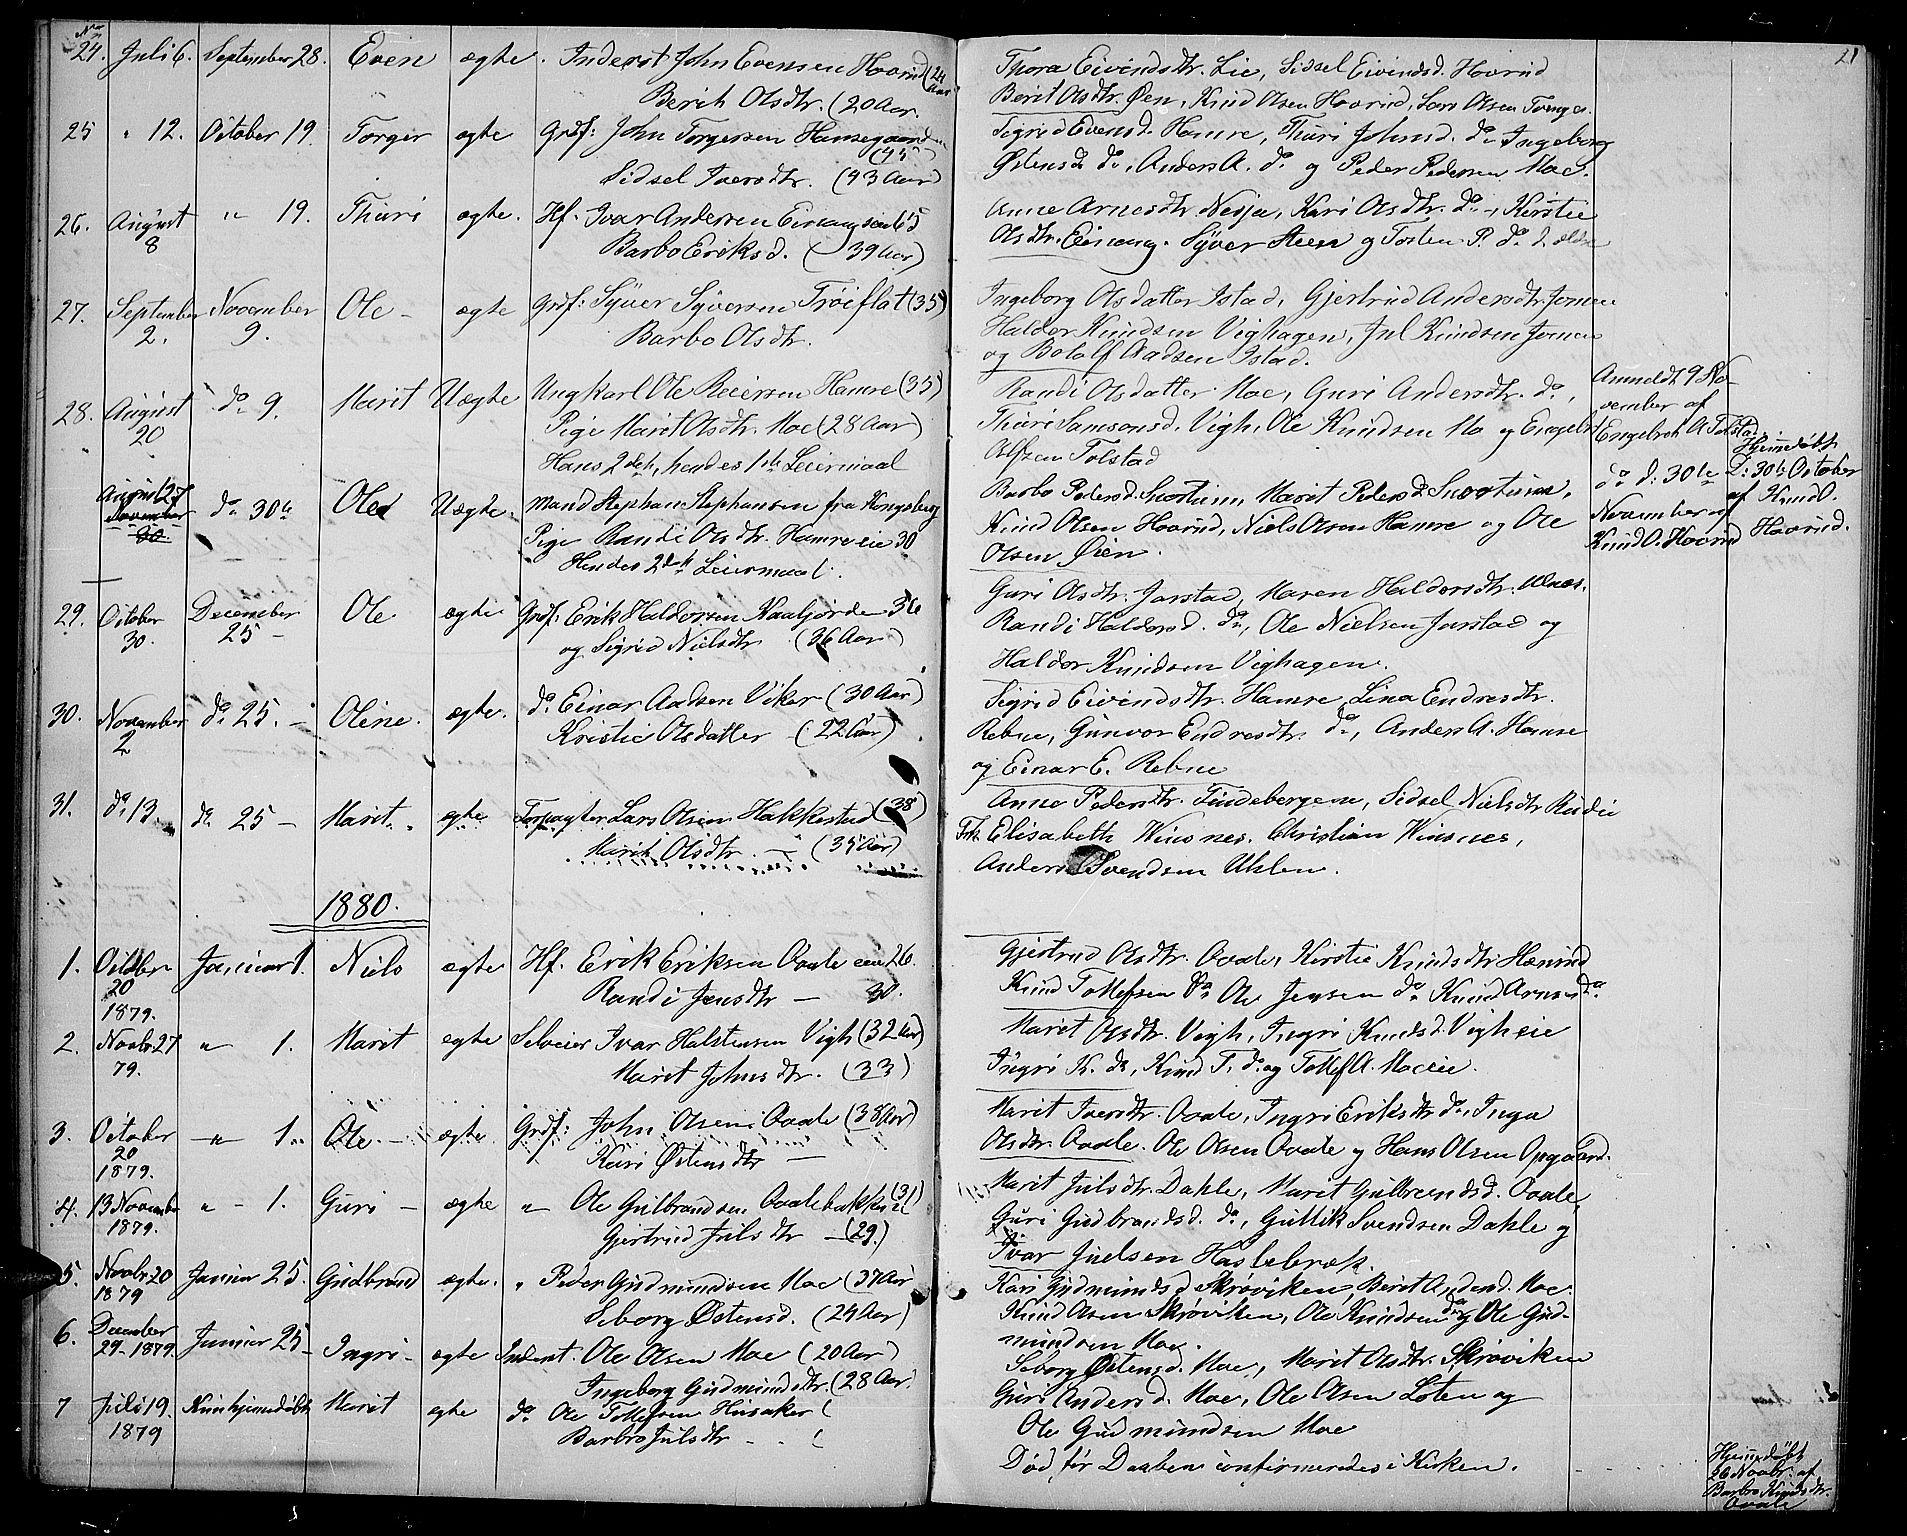 SAH, Vestre Slidre prestekontor, Klokkerbok nr. 1, 1869-1882, s. 21